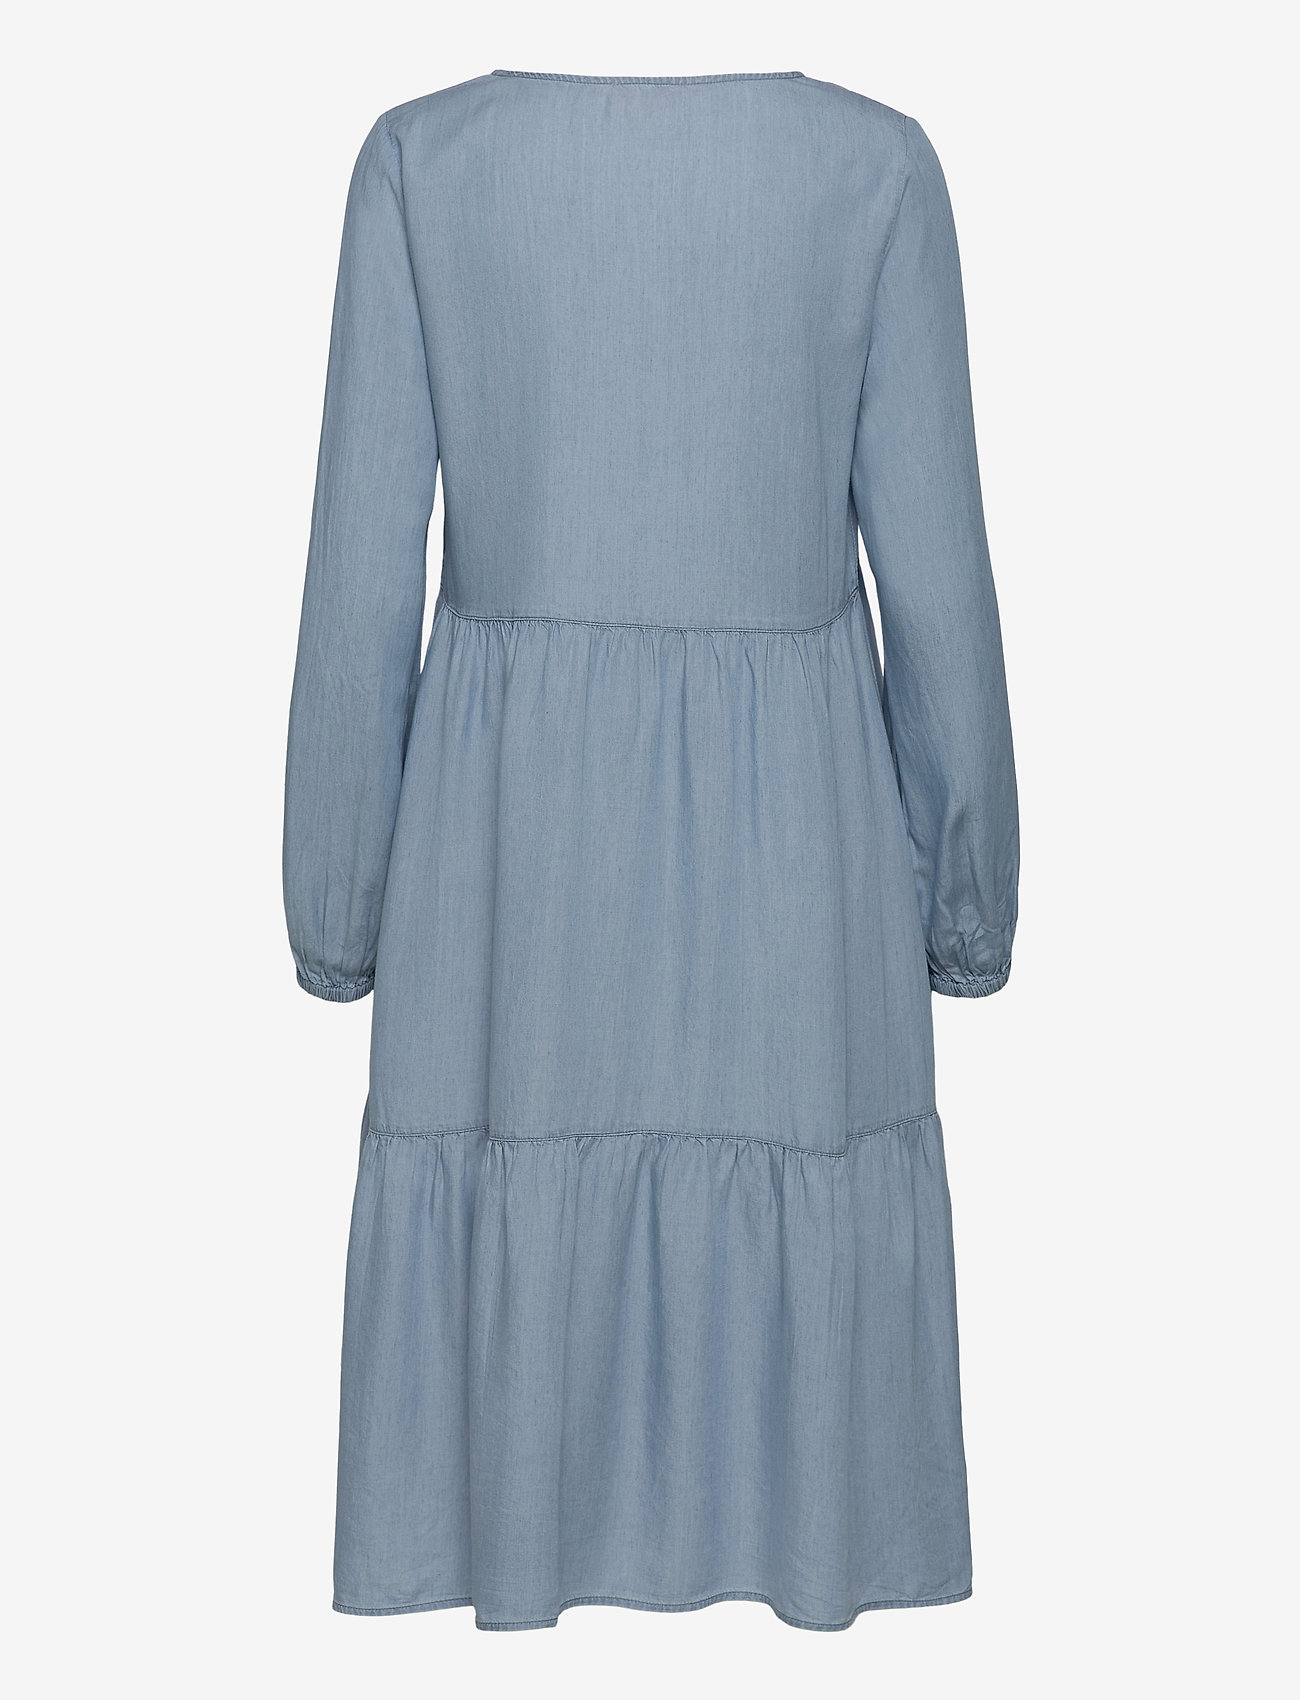 EDC by Esprit - Dresses denim - midi dresses - blue light wash - 1